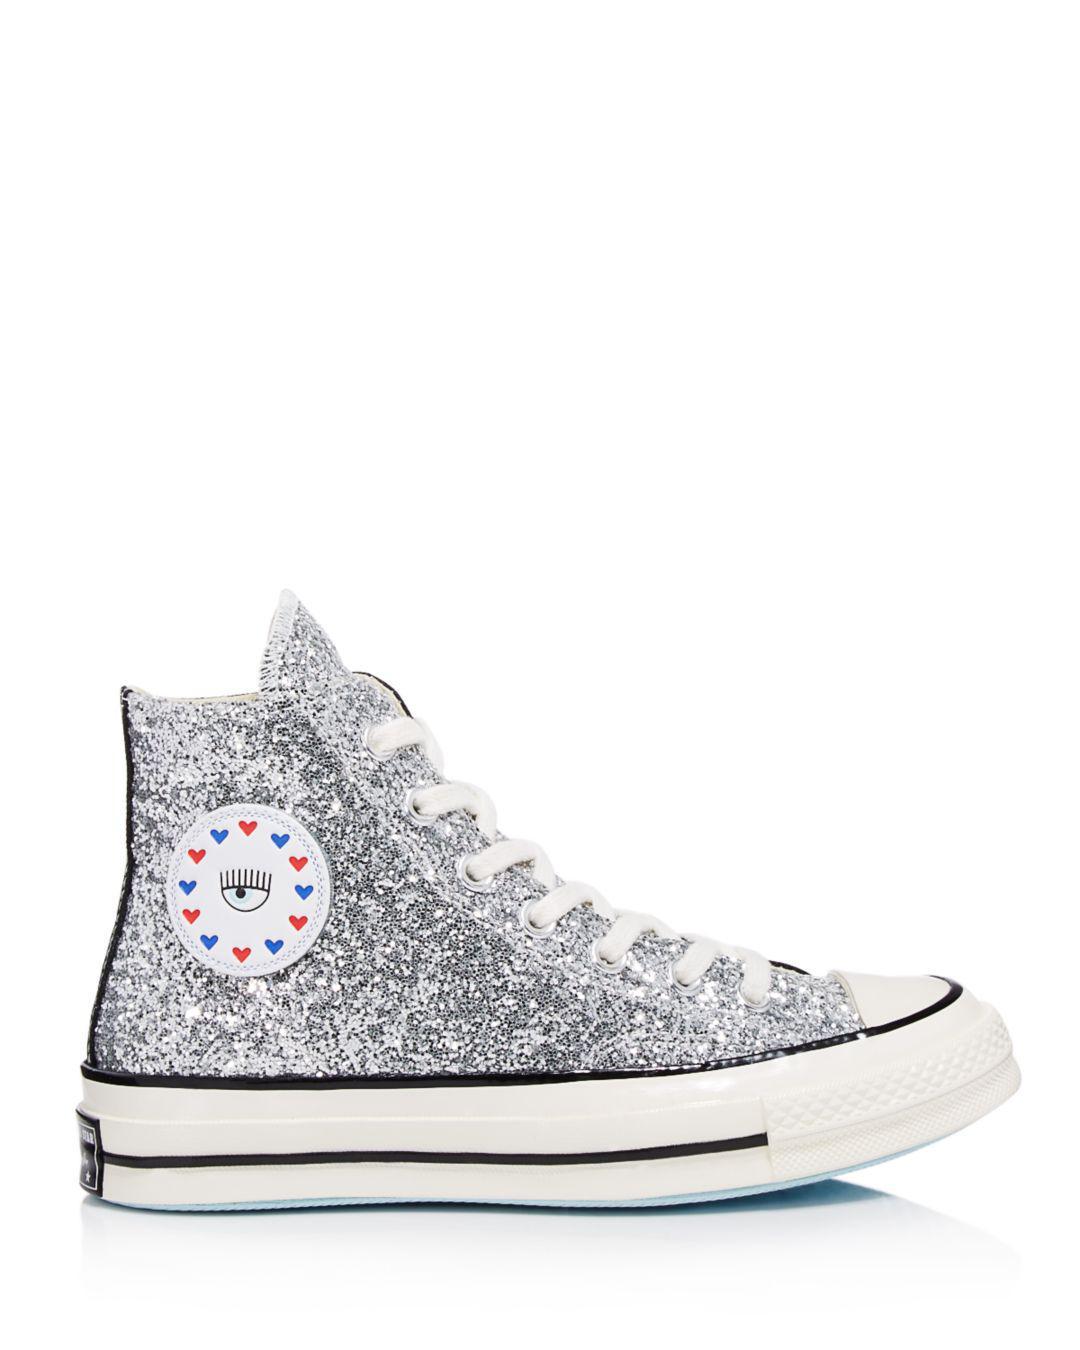 9d4a92beb1fe Converse X Chiara Ferragni Women s Chuck Taylor Glitter High Top Sneakers -  Lyst